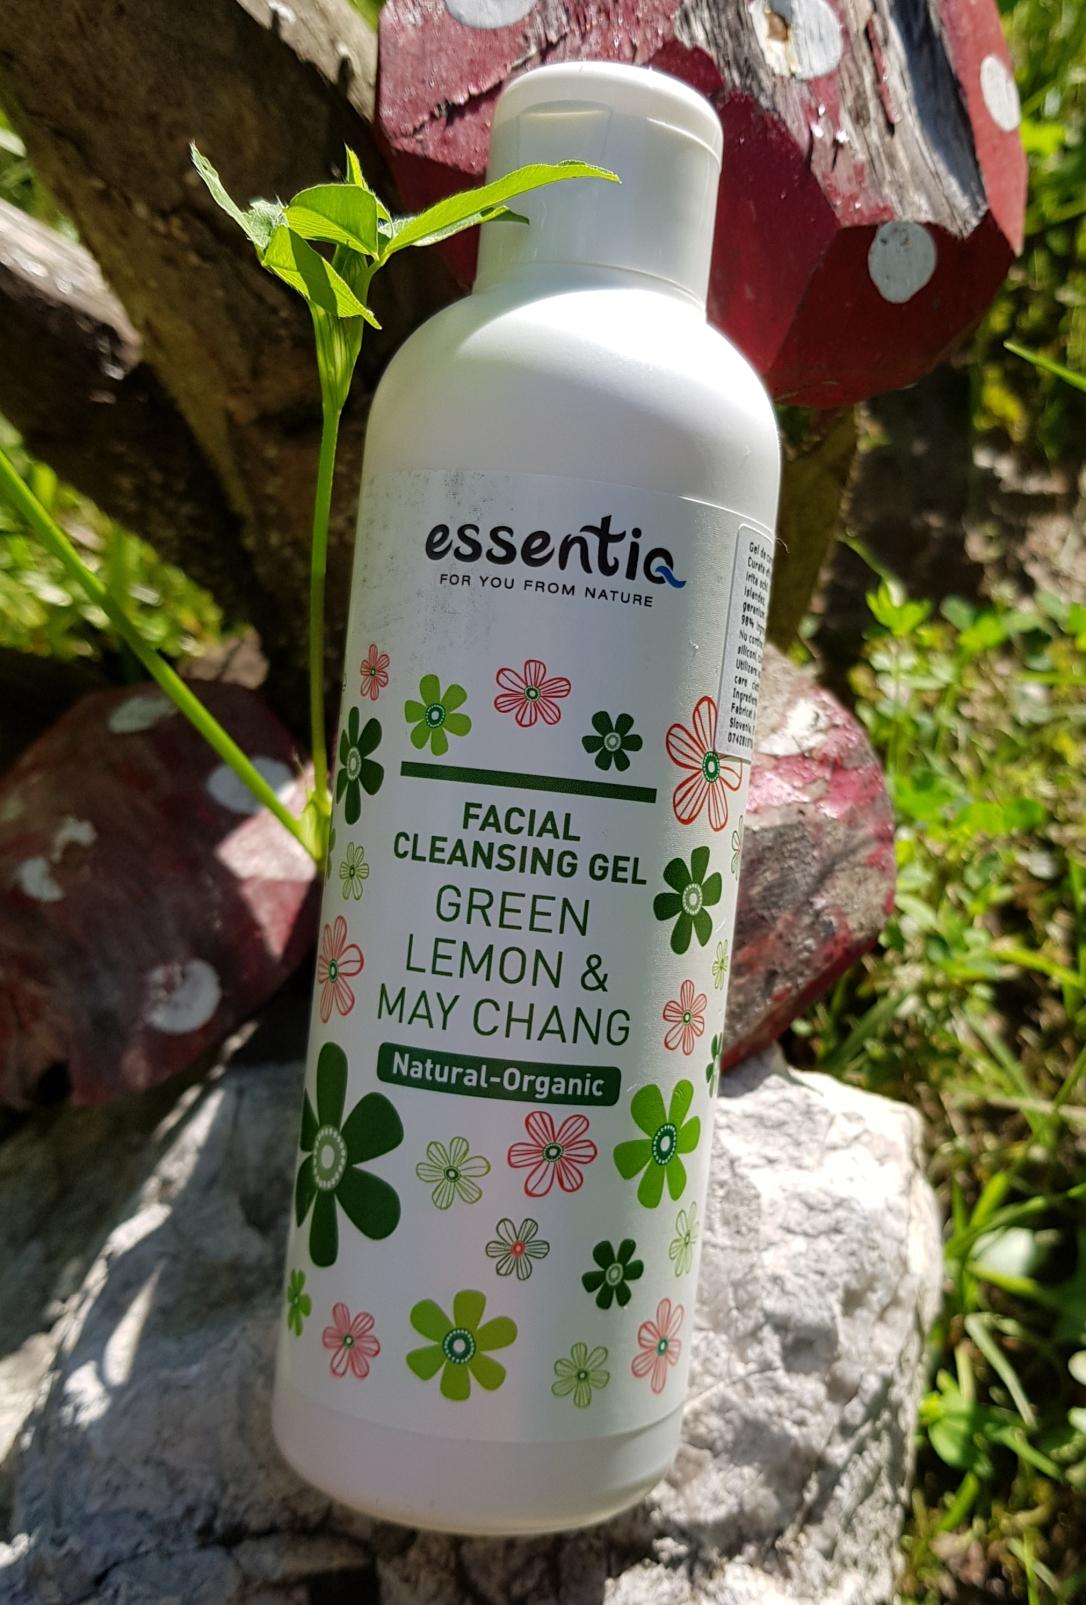 Bioaleea Gel de curățare facial cu Lamaie Verde & May Chang de la Essentiq vegan cruelty-free organic